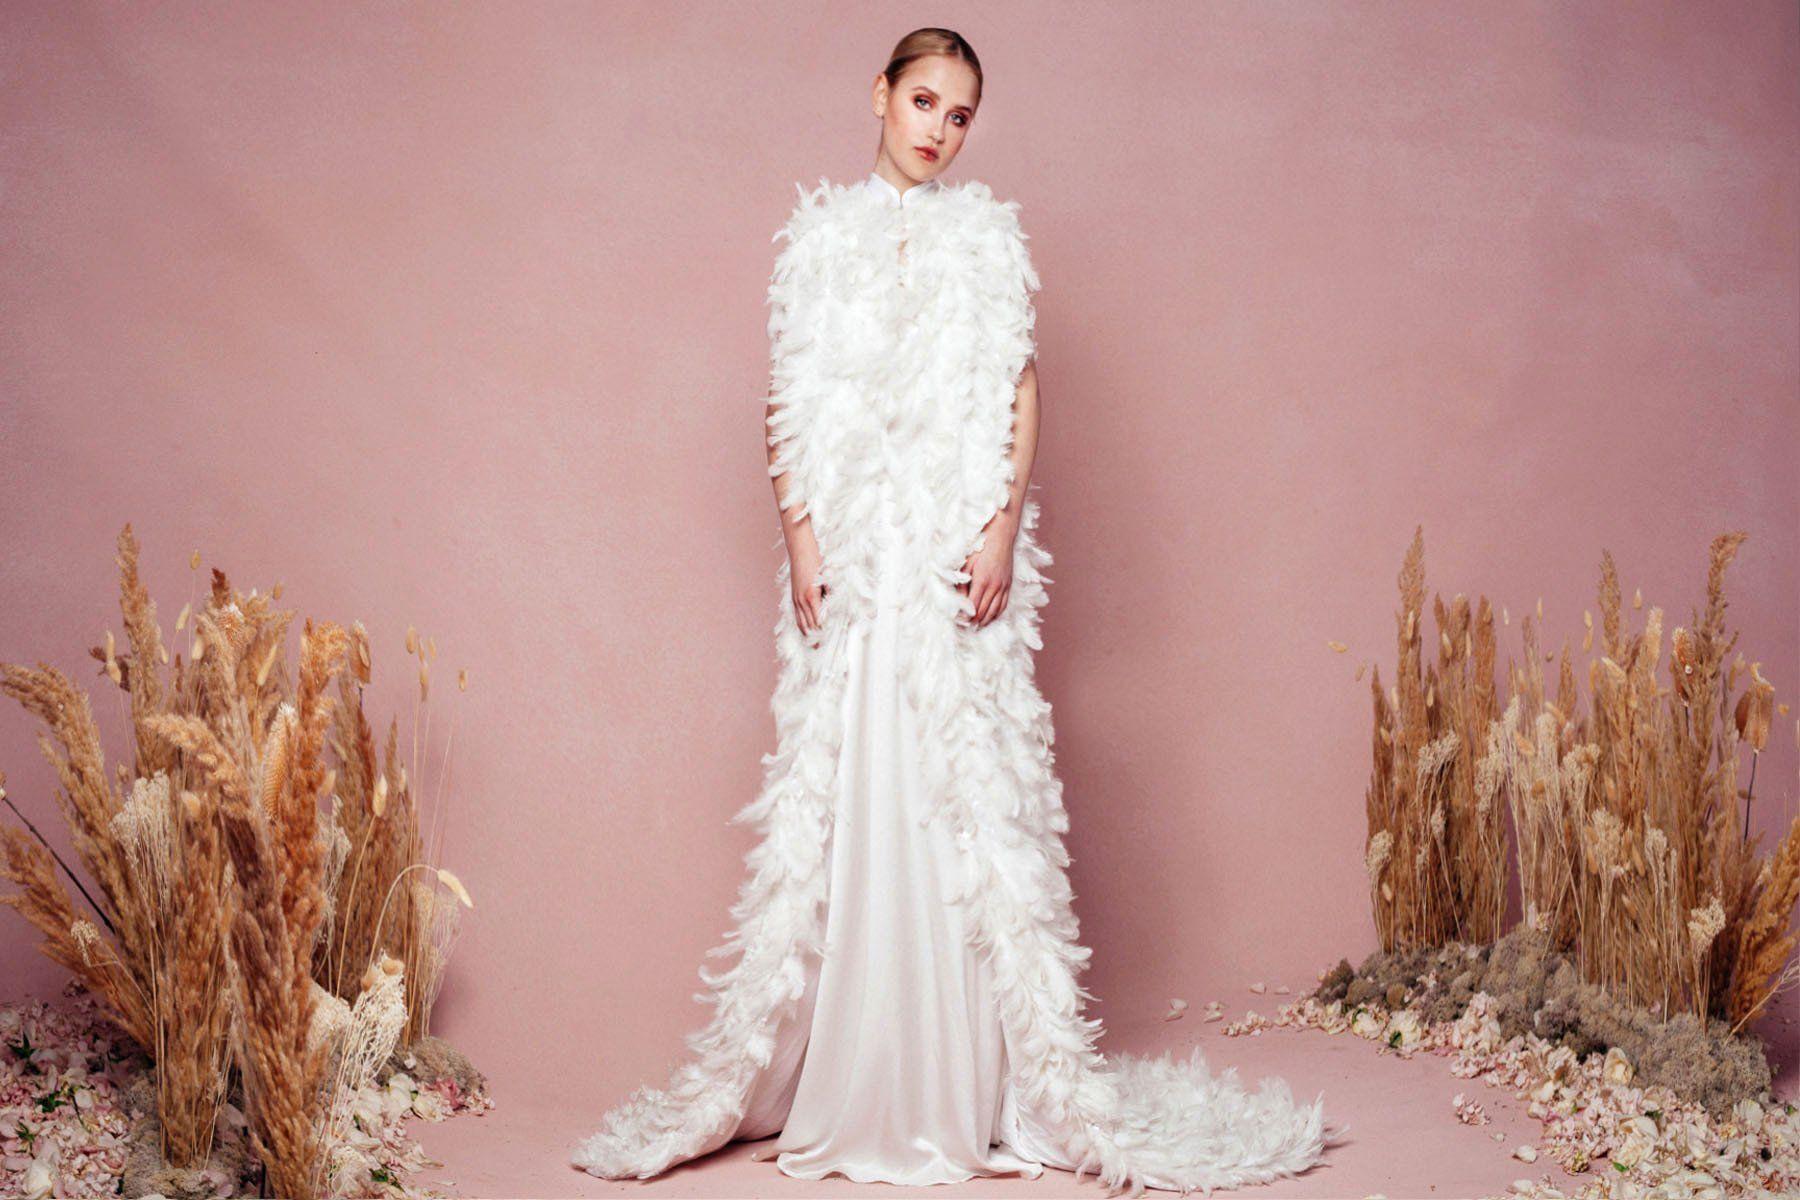 Encantador Vestidos De Novia Fort Wayne Indiana Fotos - Ideas de ...